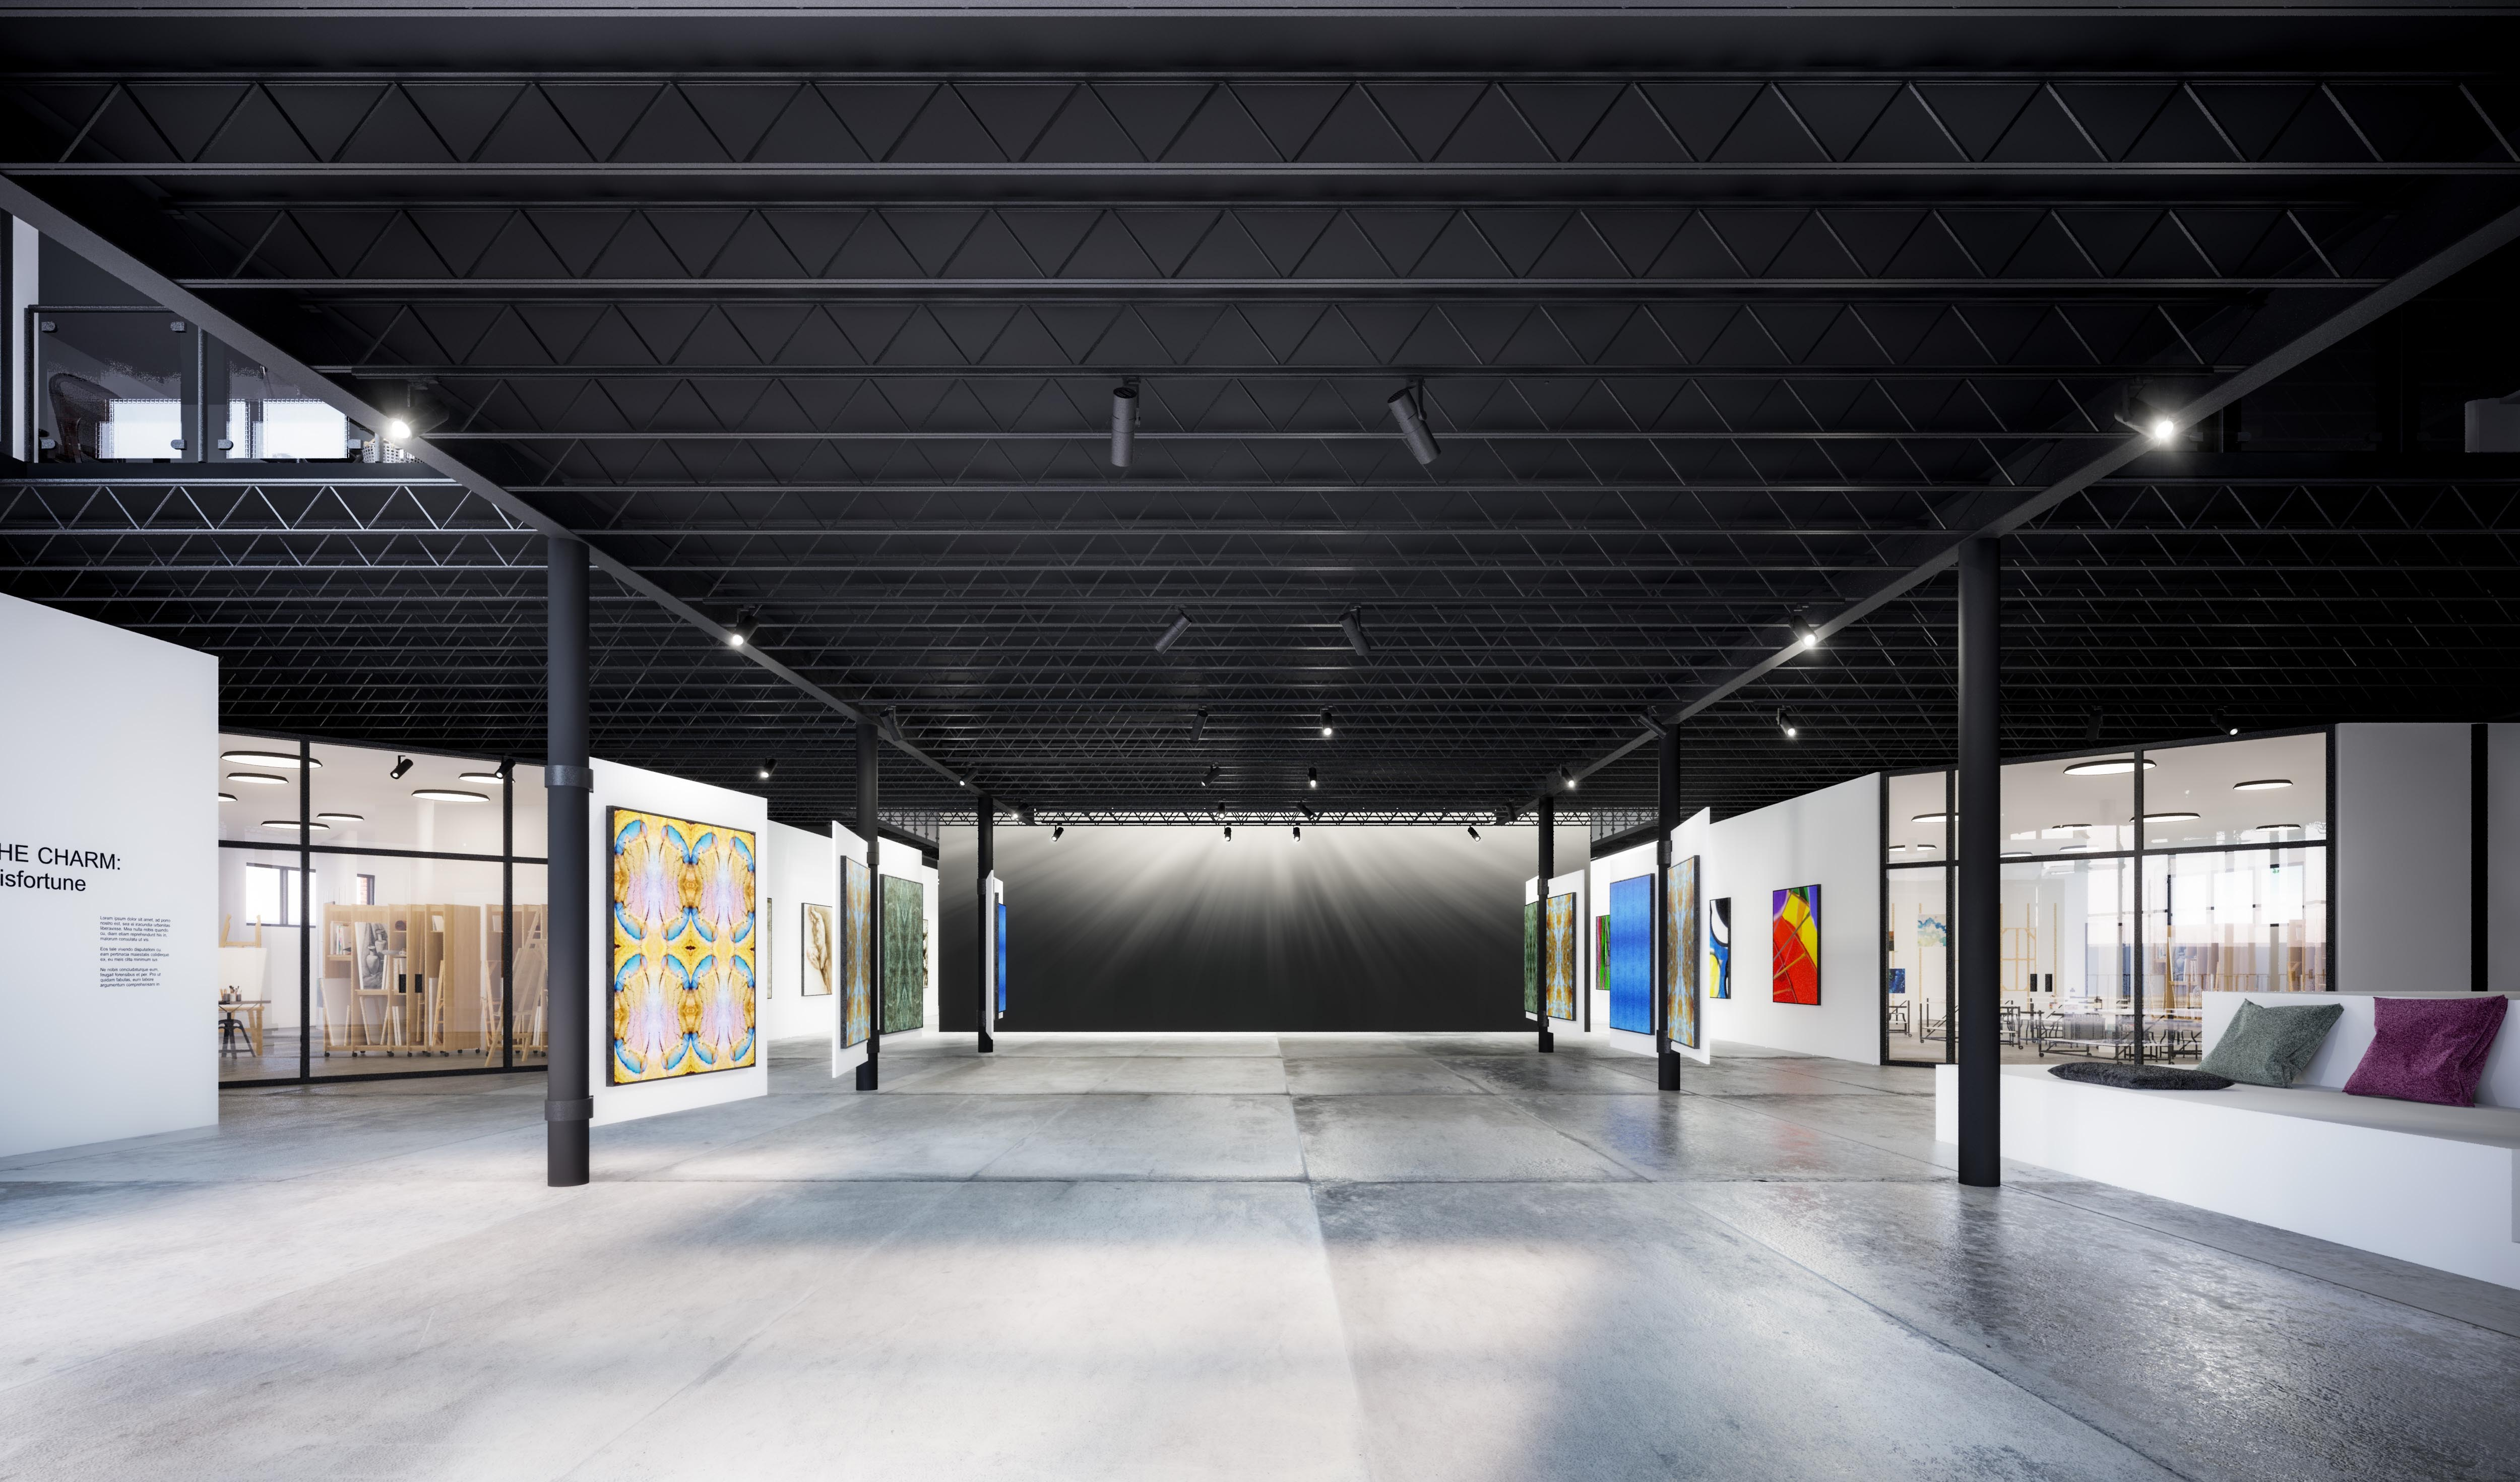 louisville-visual-arts-exhibition